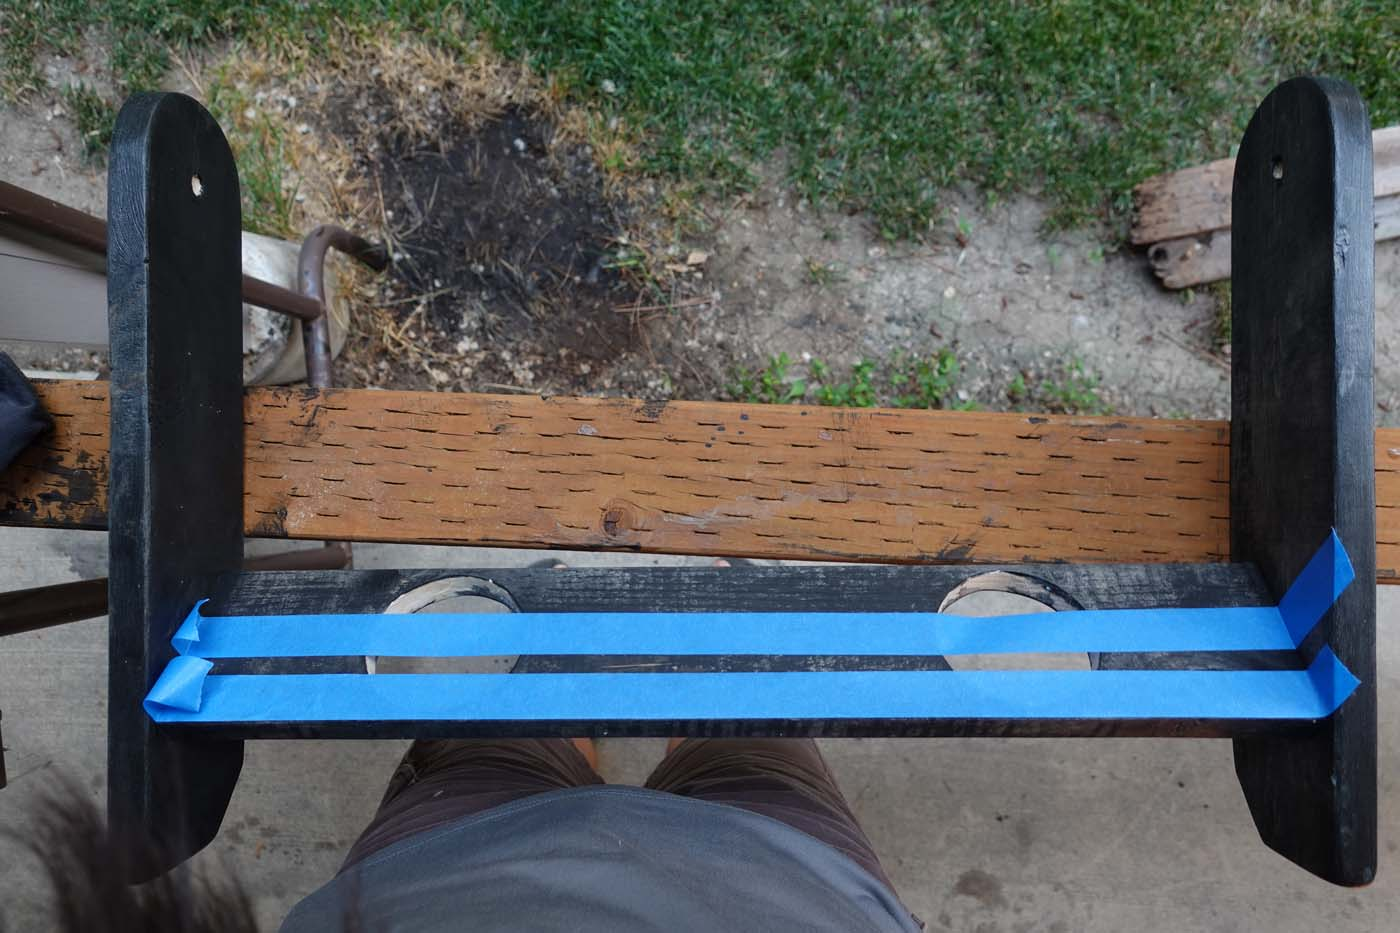 Using painter's tape on cornhole legs